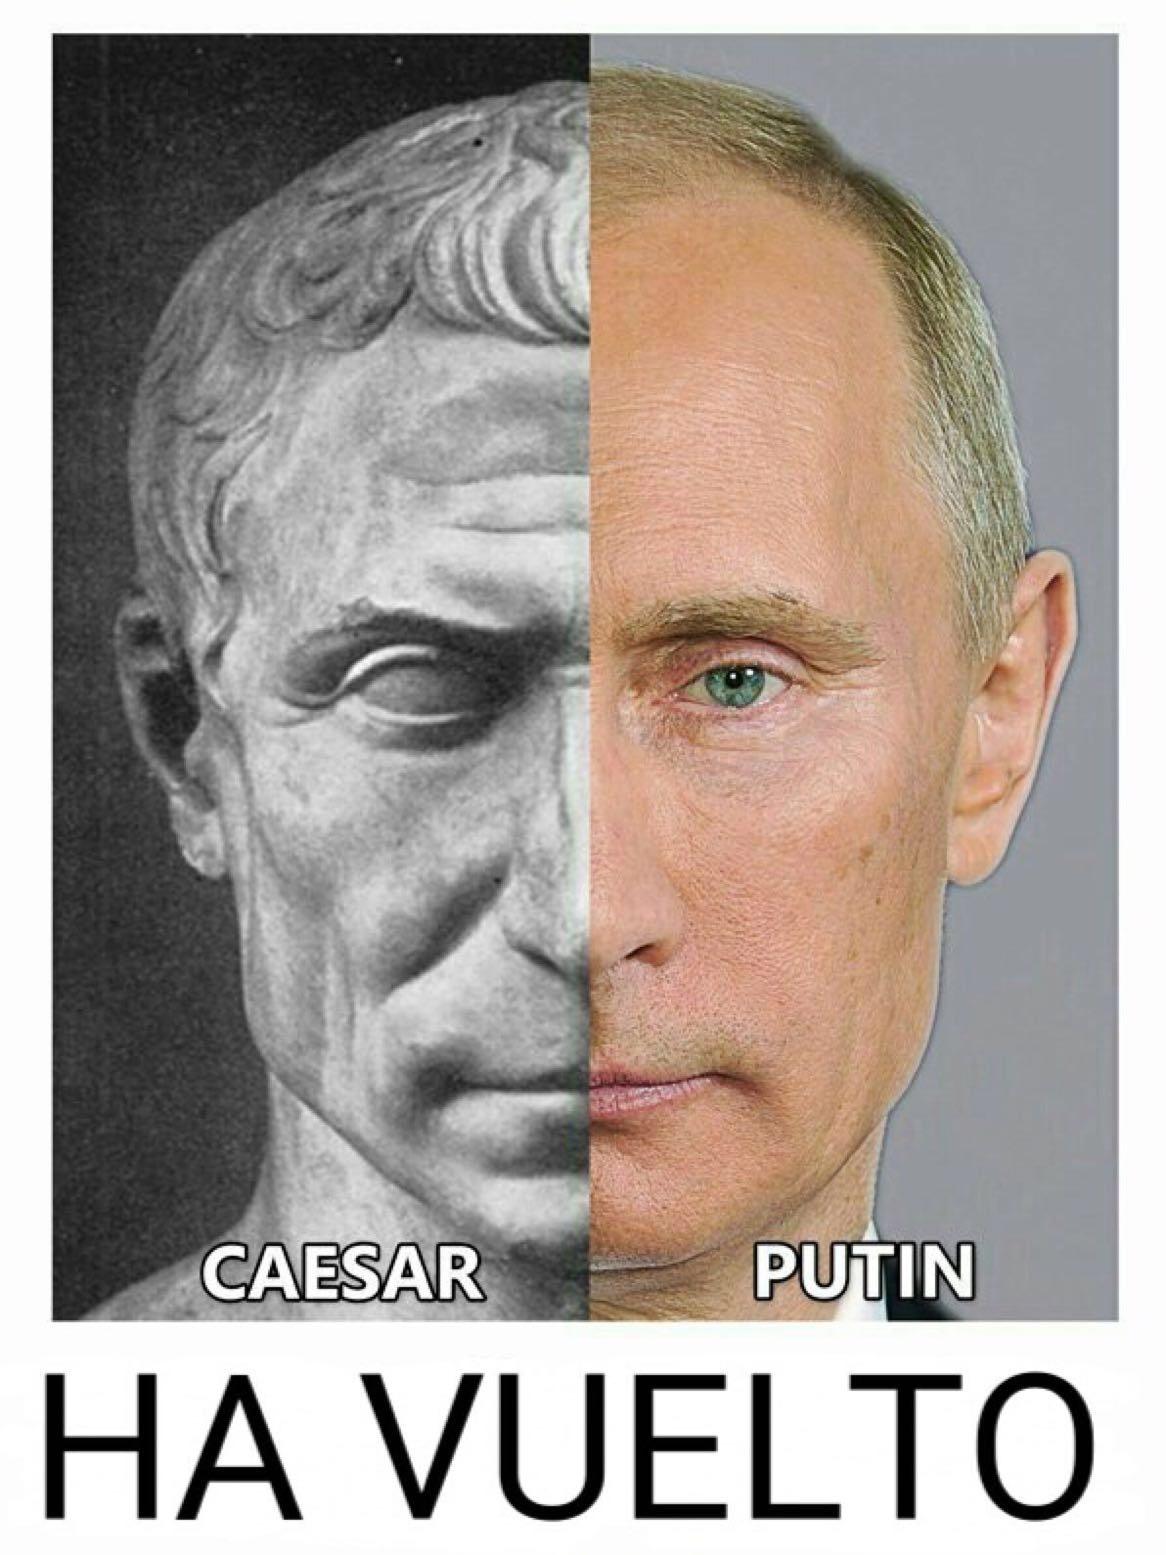 Ave, Putin, morituri te salutant - meme